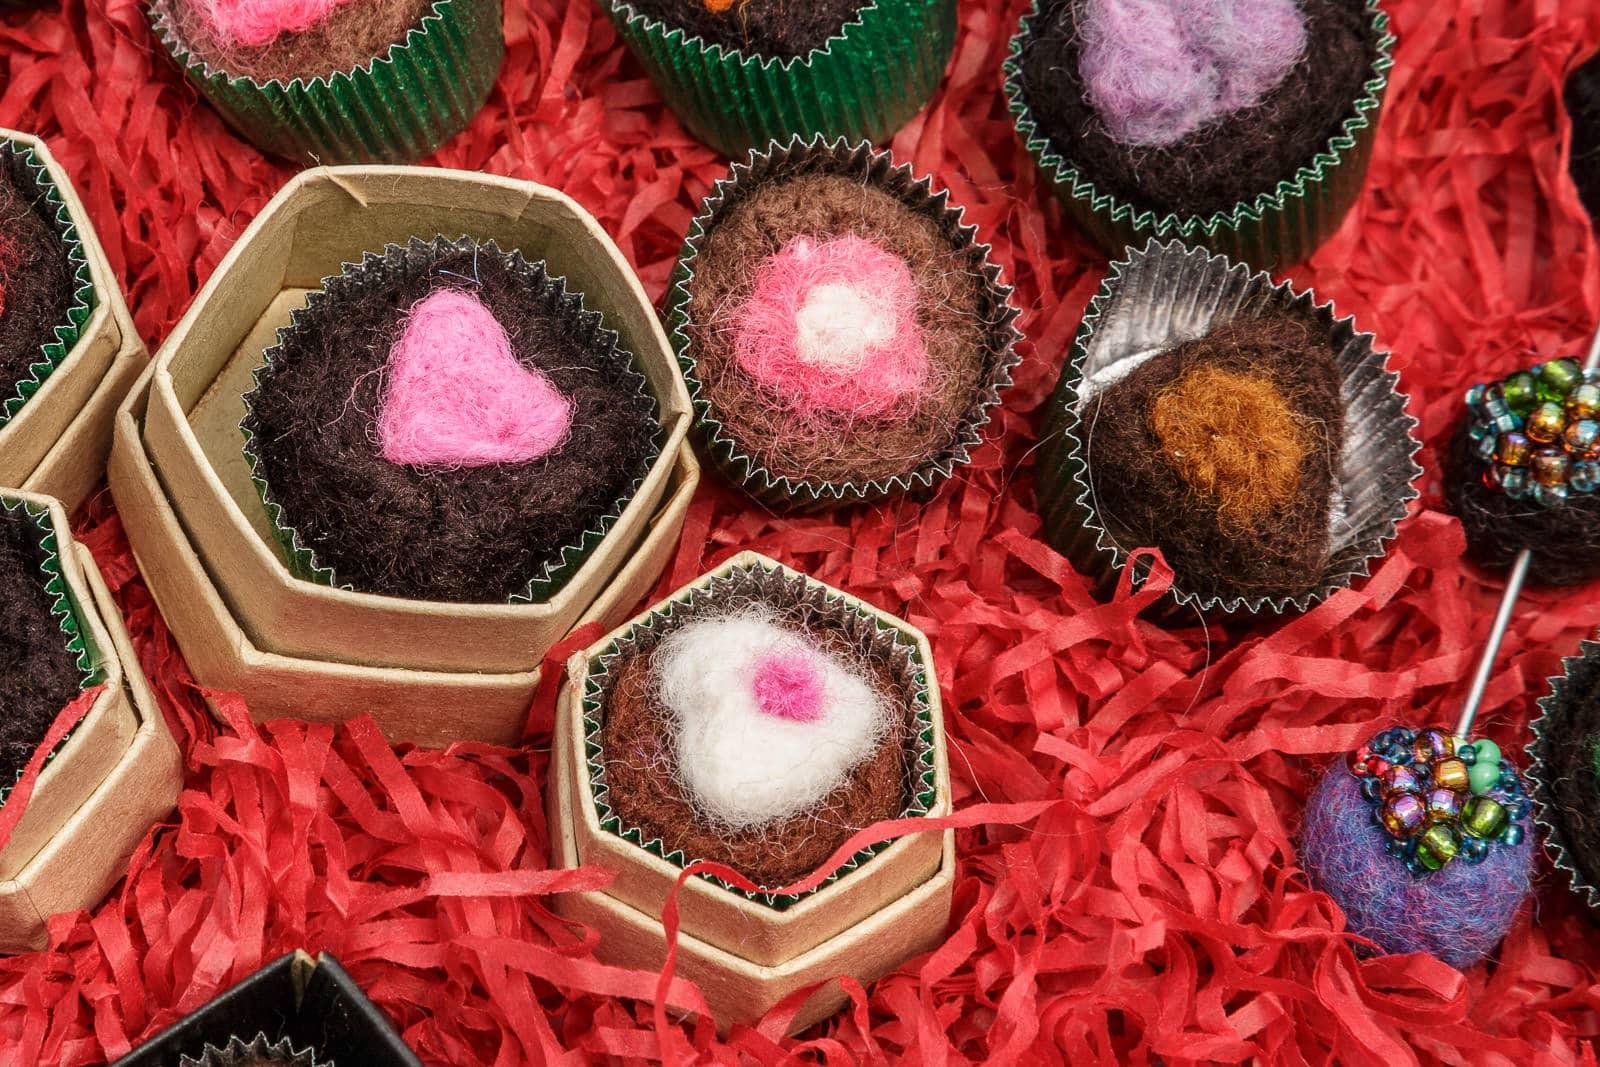 felt chocolate selection product close-up